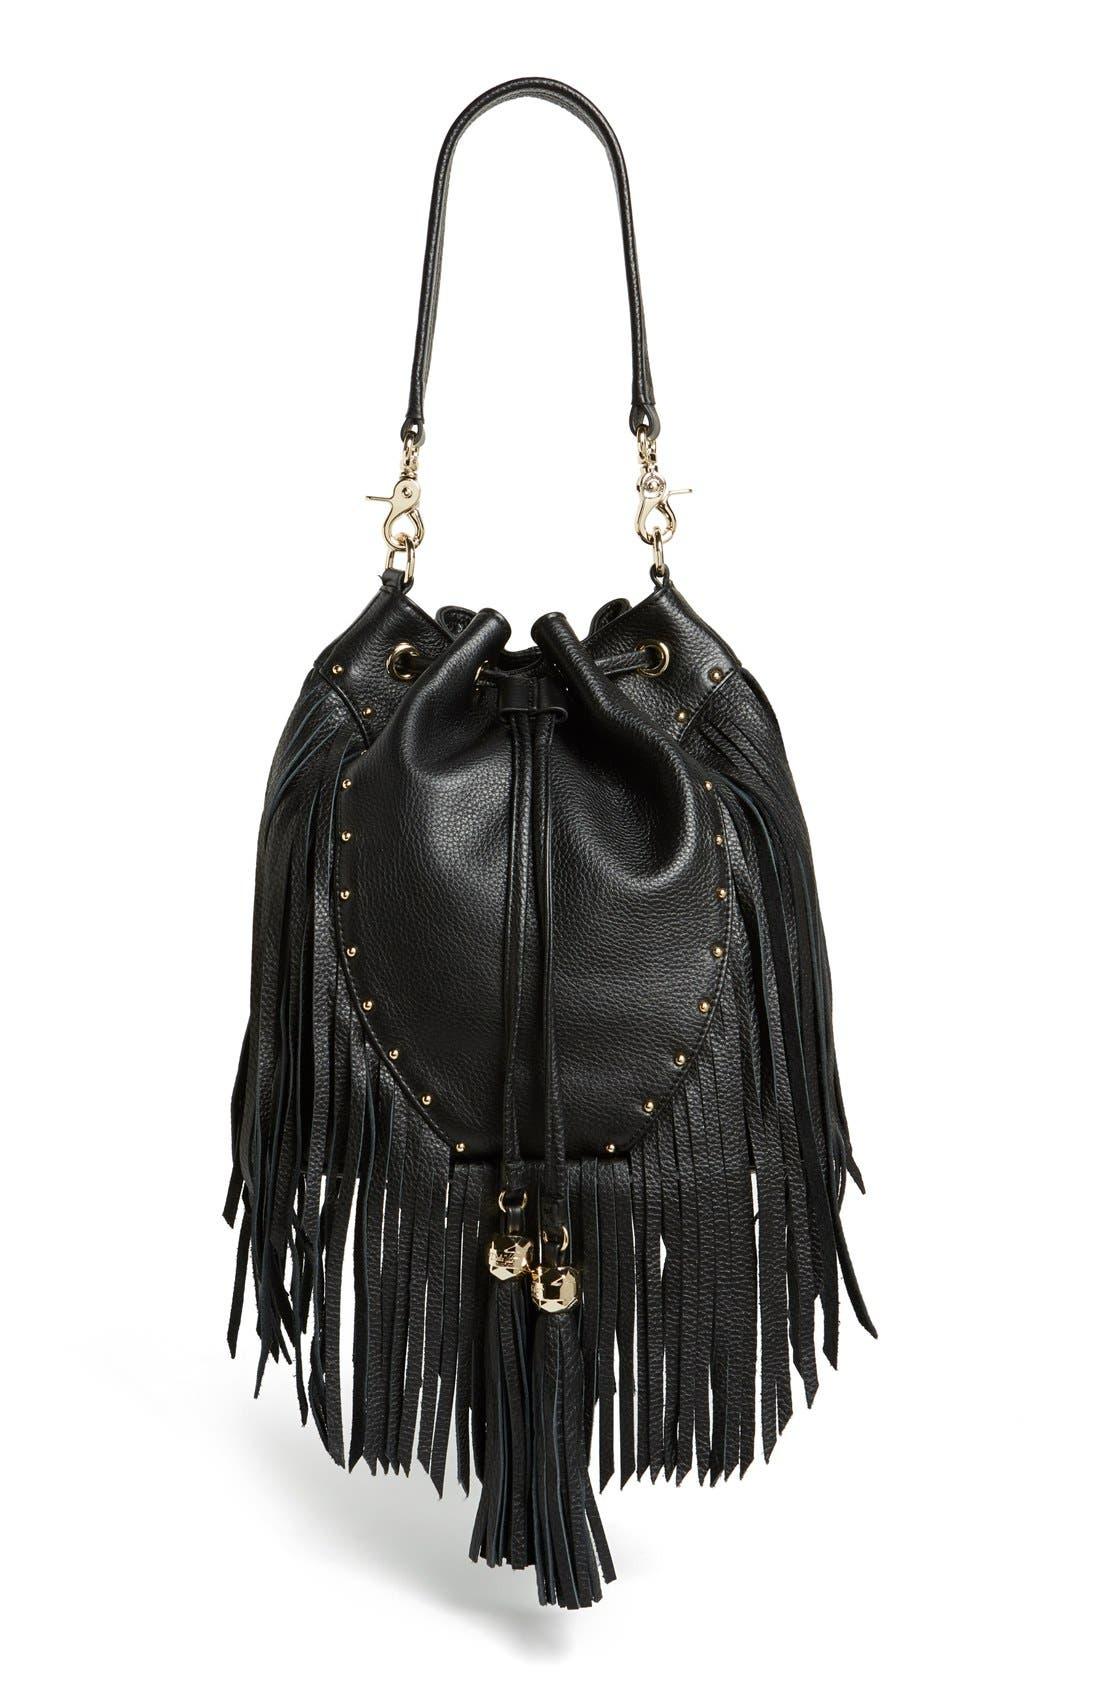 Alternate Image 1 Selected - Dolce Vita 'Amber' Fringe Leather Backpack